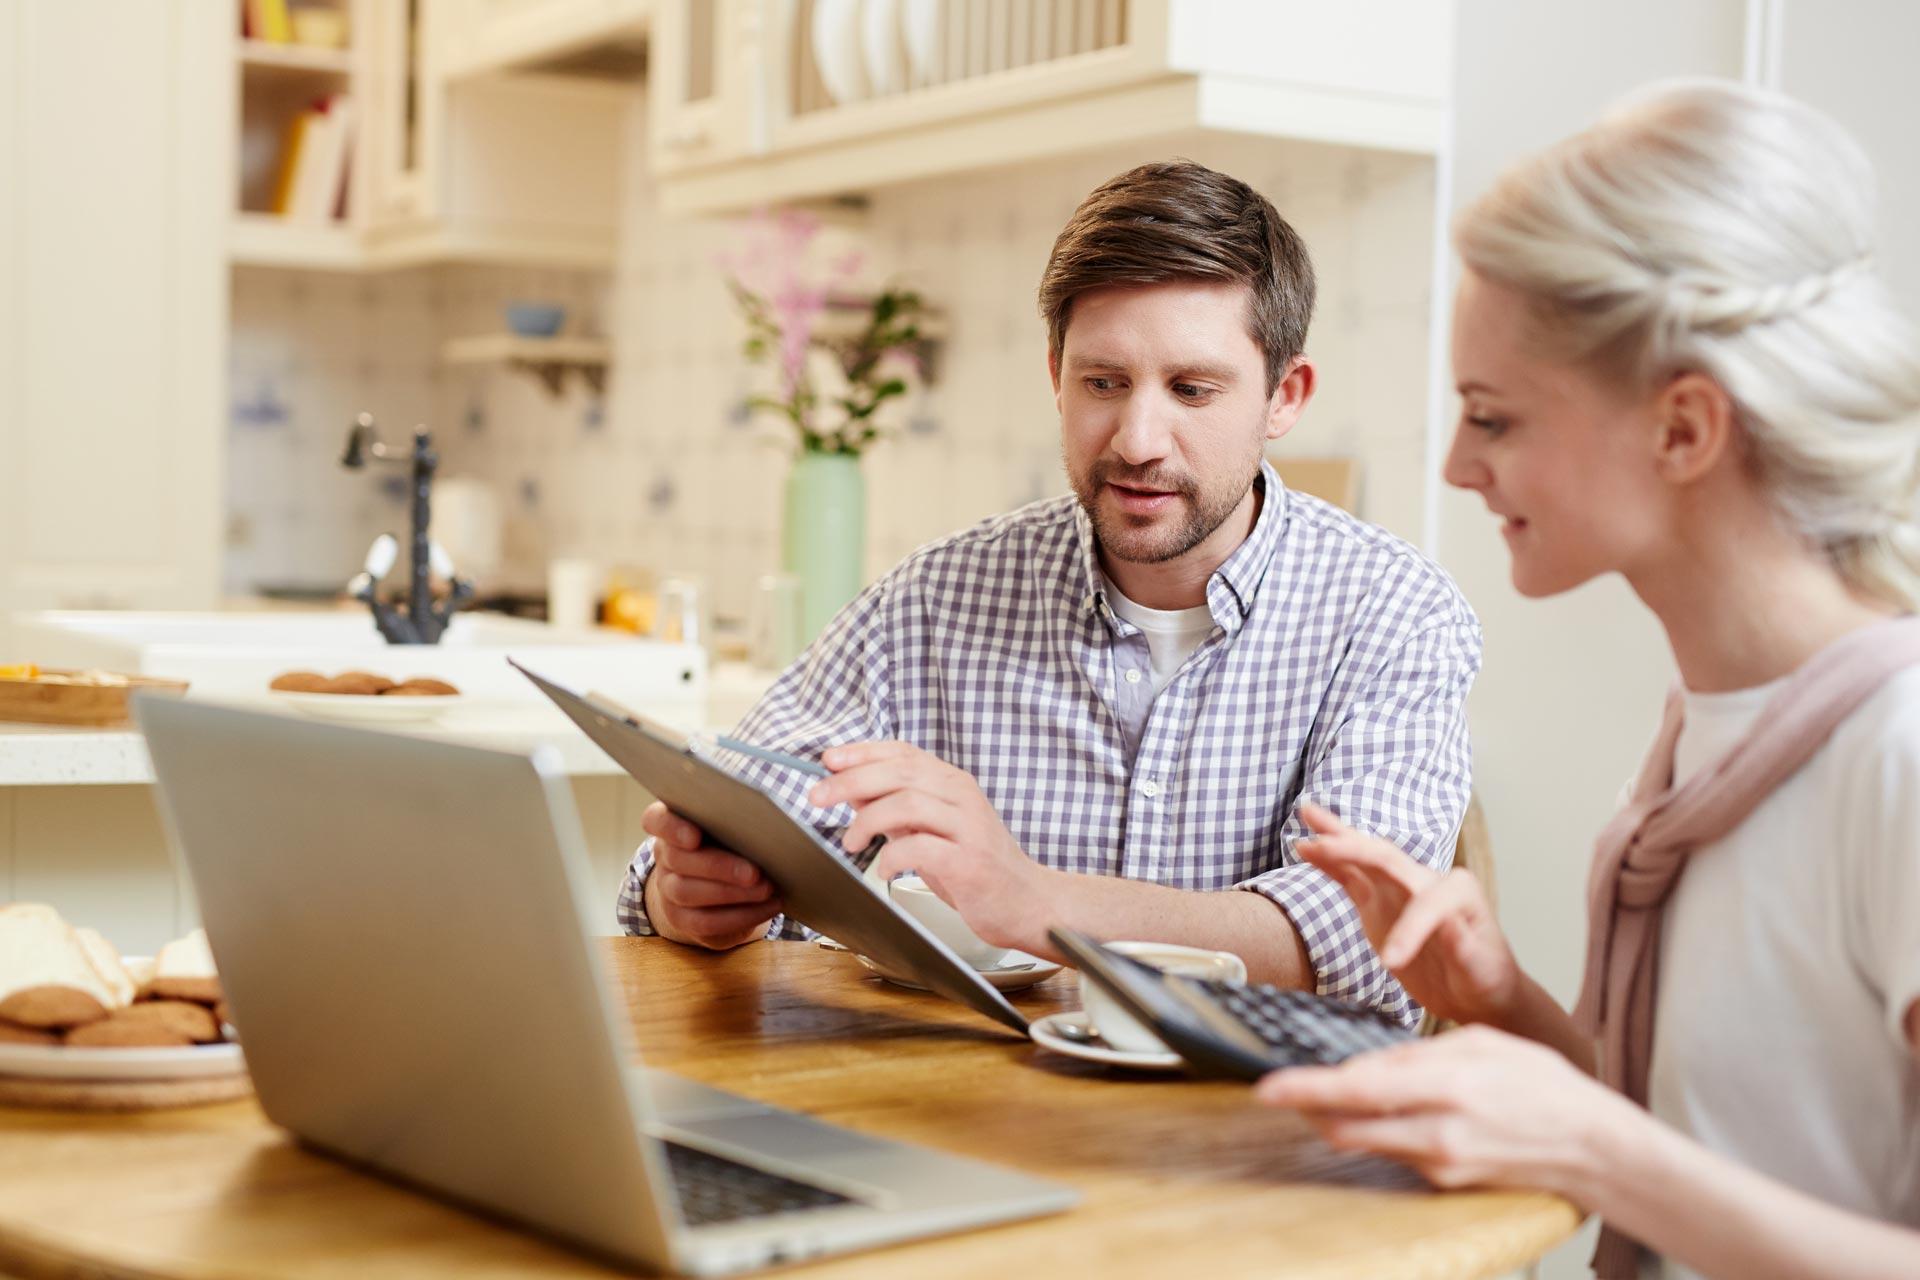 5 Creative Ways To Fund Your Condo Renovations